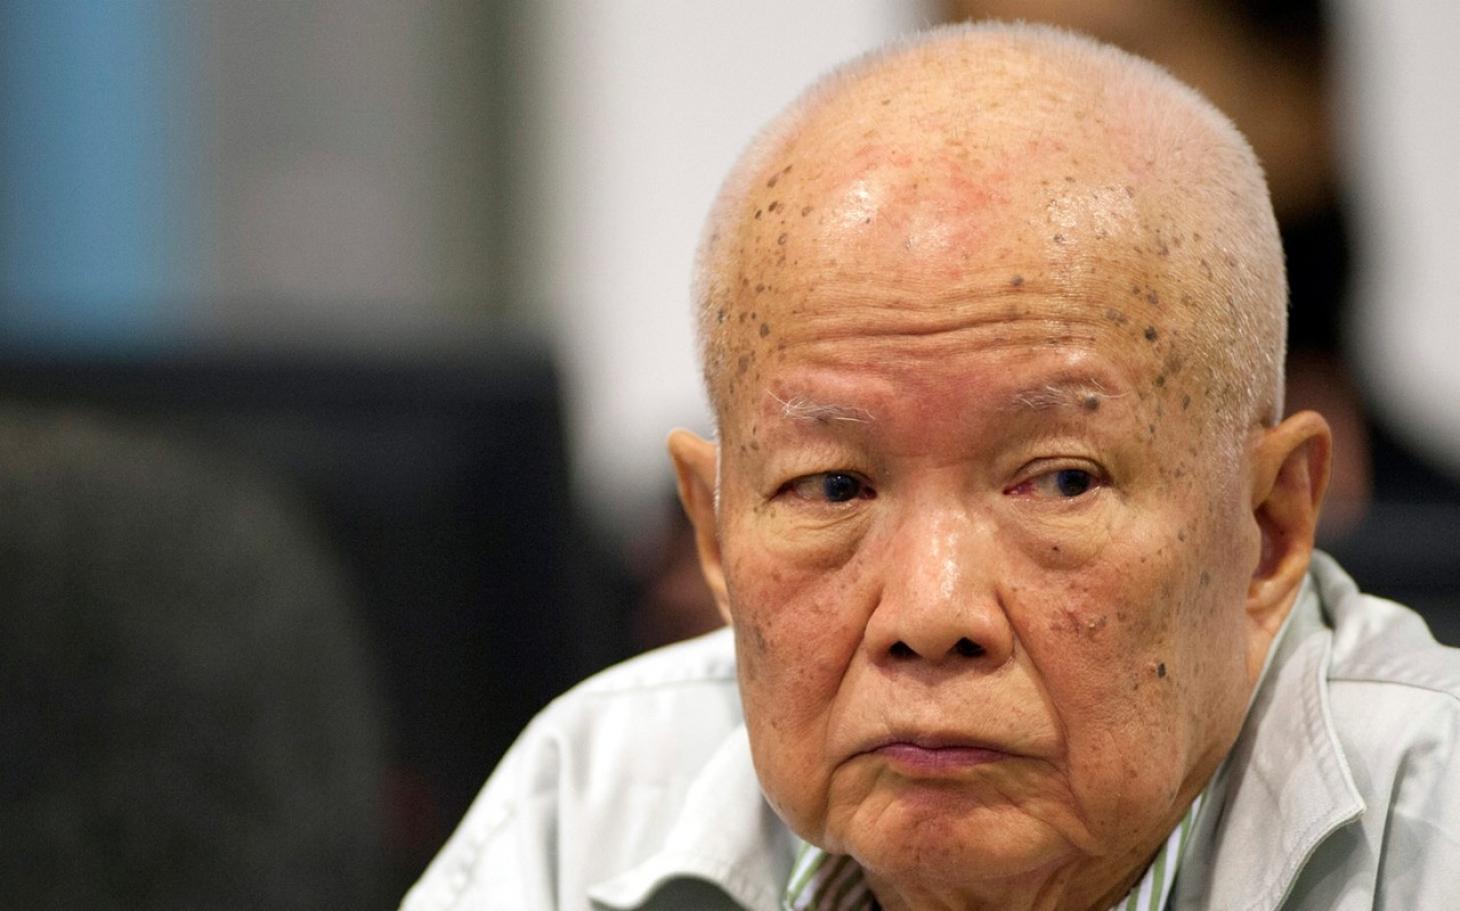 Khmer Rouge leaders convicted by tribunal | Al Jazeera America | 1460 x 911 jpeg 653kB